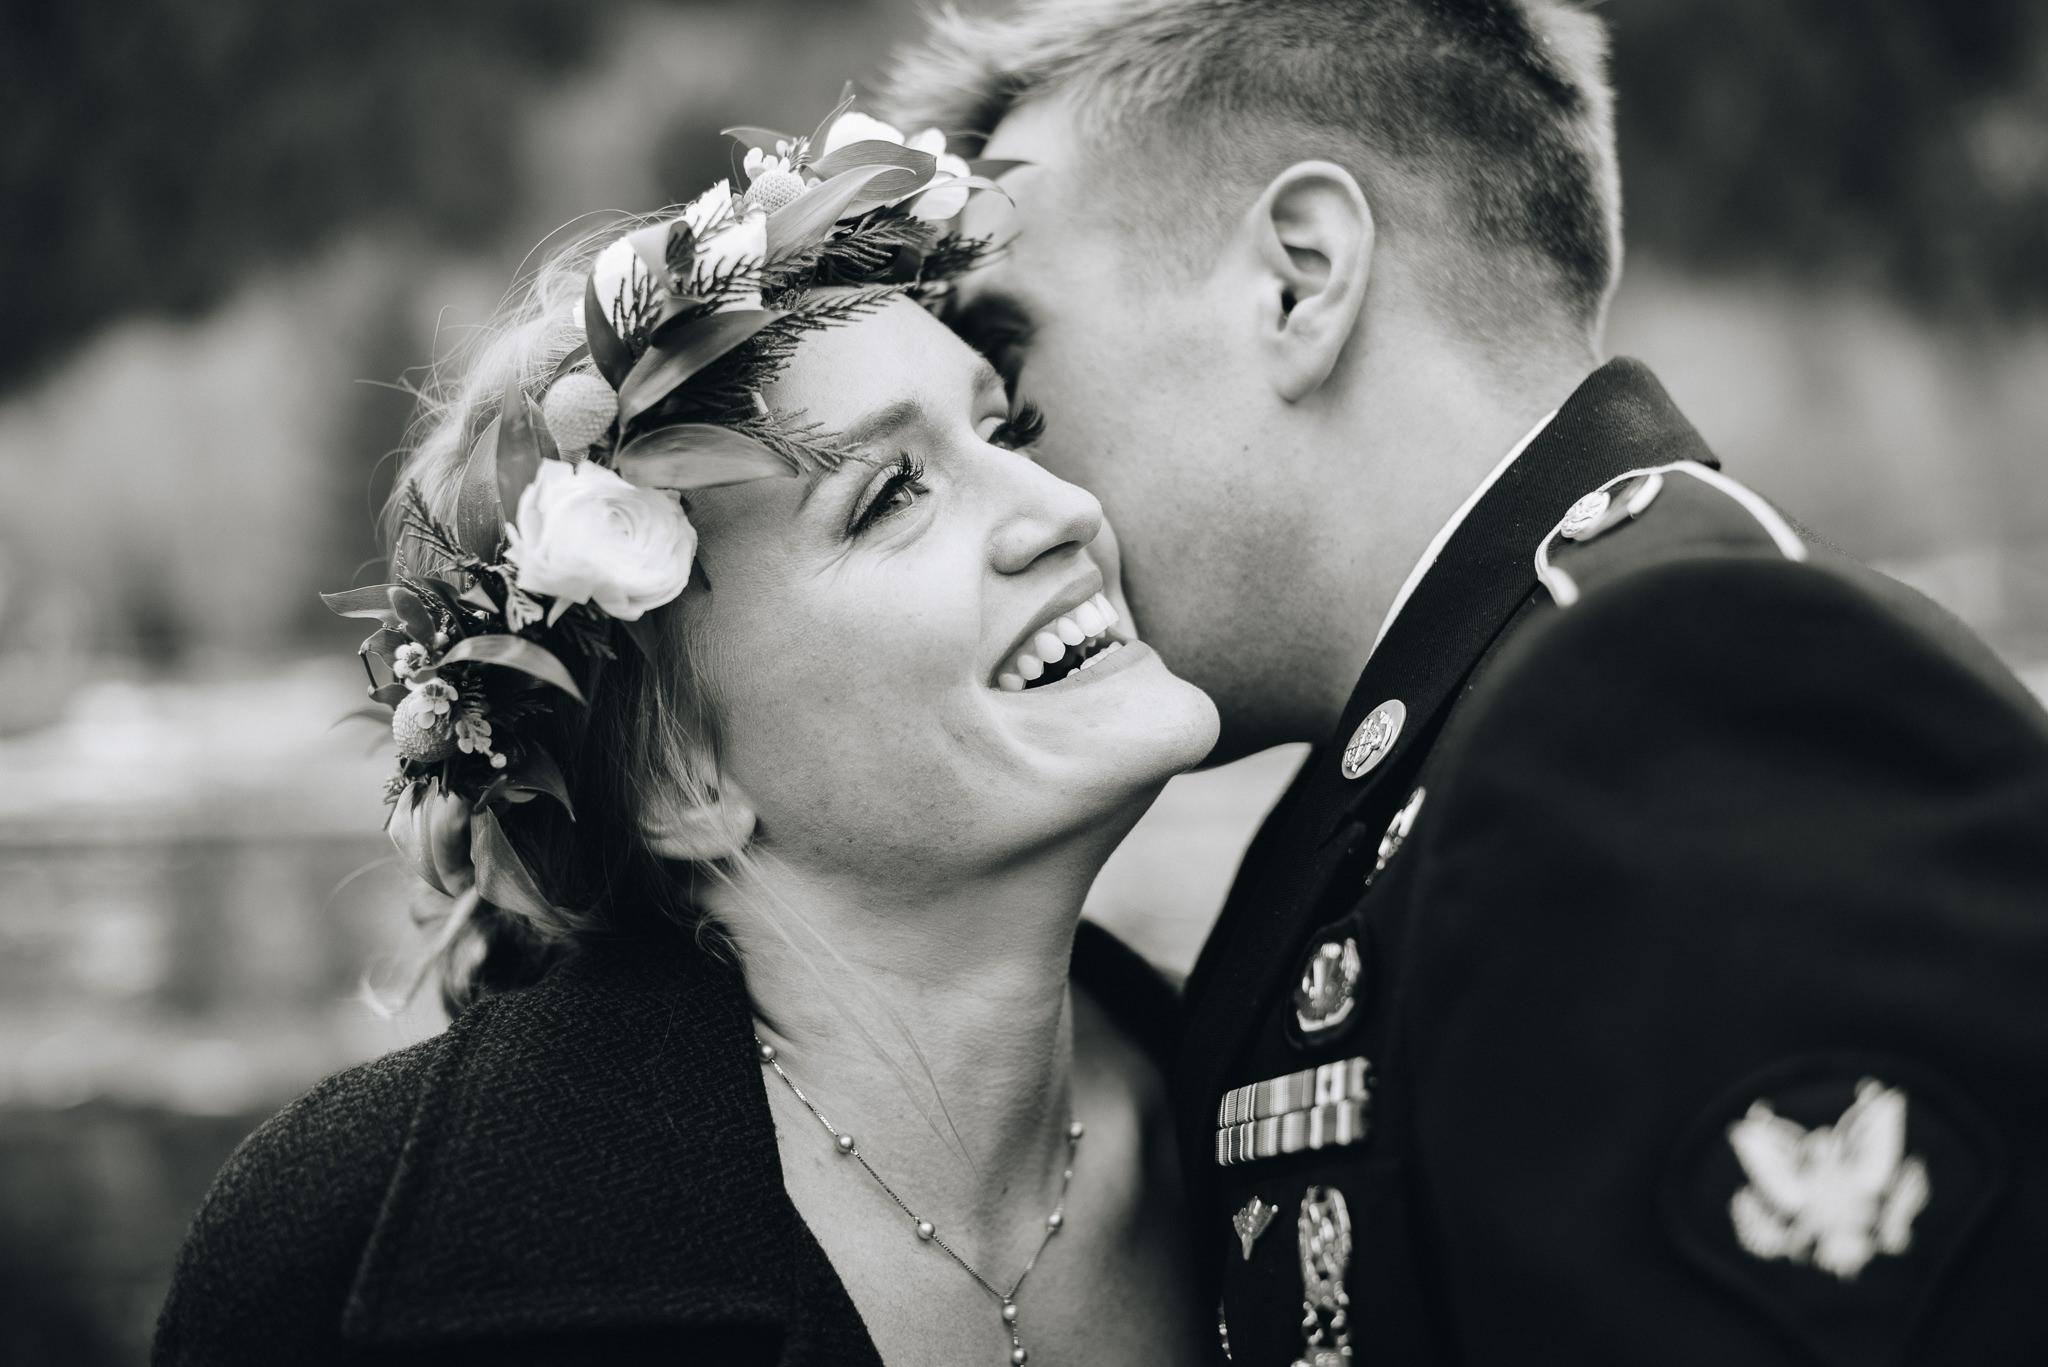 Trevor-Hooper-Wedding-Photographer-The-Bungalow-Wedding-Utah_BW_015.jpg